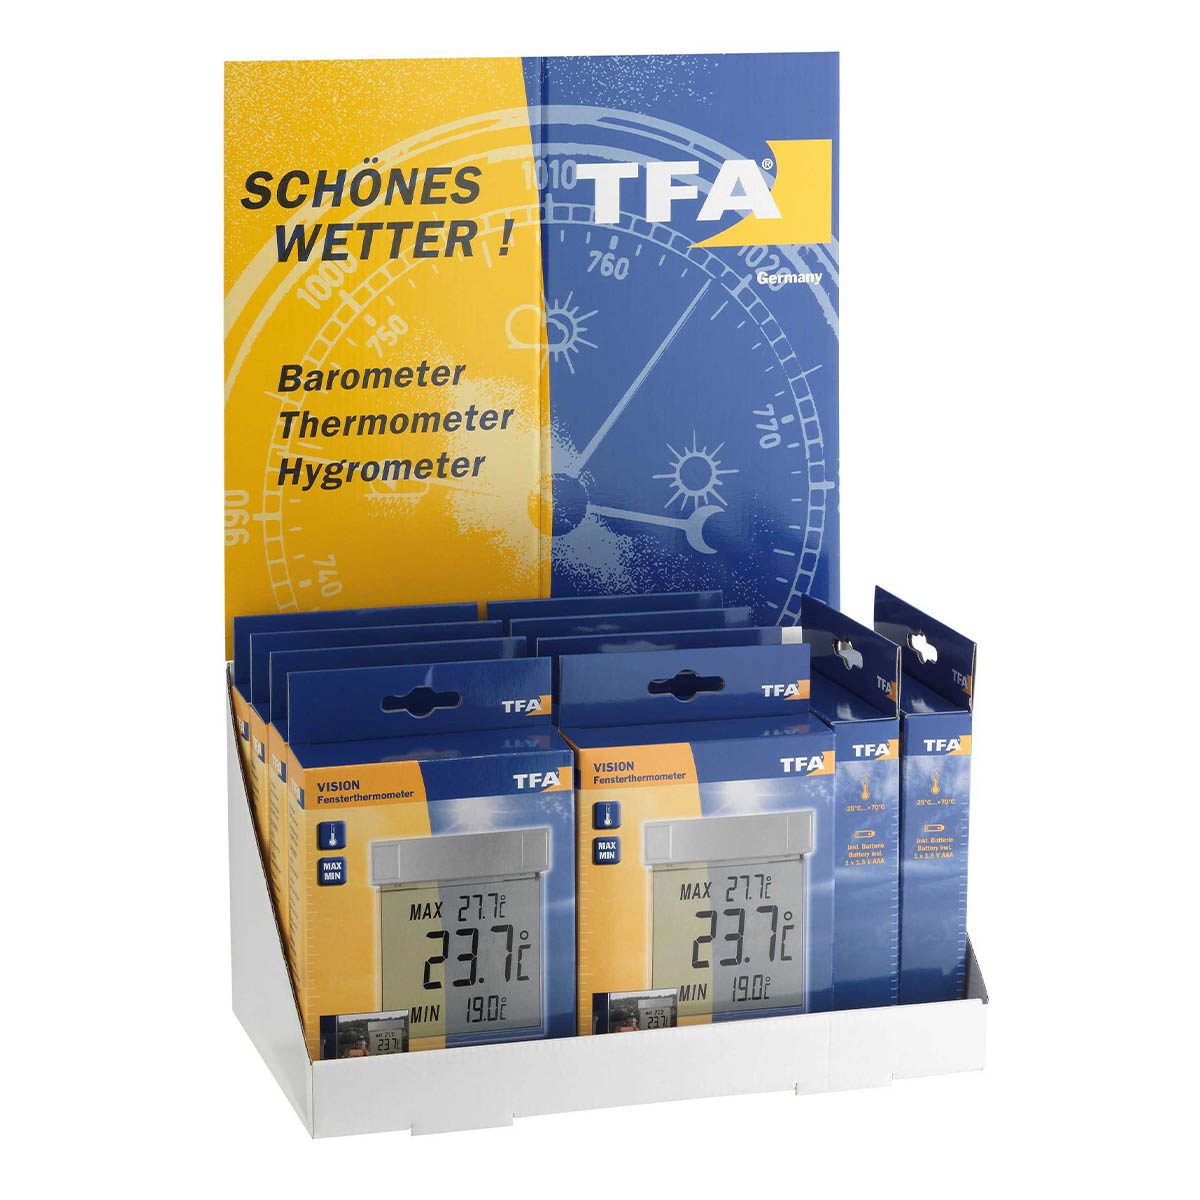 95-2009-tfa-thekendisplay-digitale-thermometer-1200x1200px.jpg